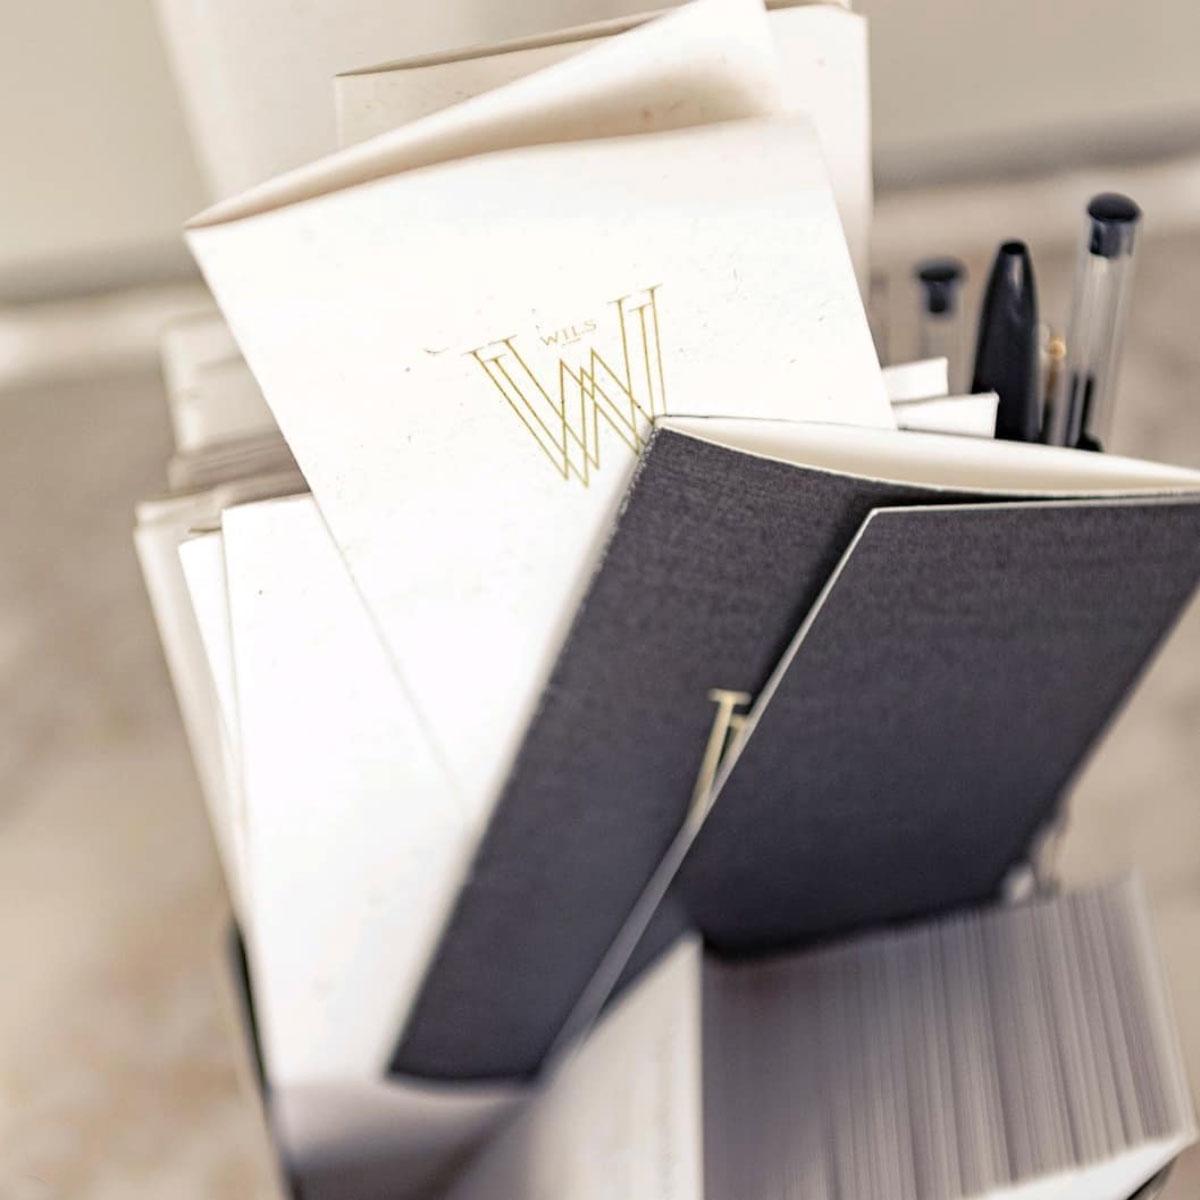 10-frontline-studio-emma-brante-macha-kontchakova-graphic-design-branding-logo-visual-identity-wils-restaurant-amsterdam-joris-bijdendijk